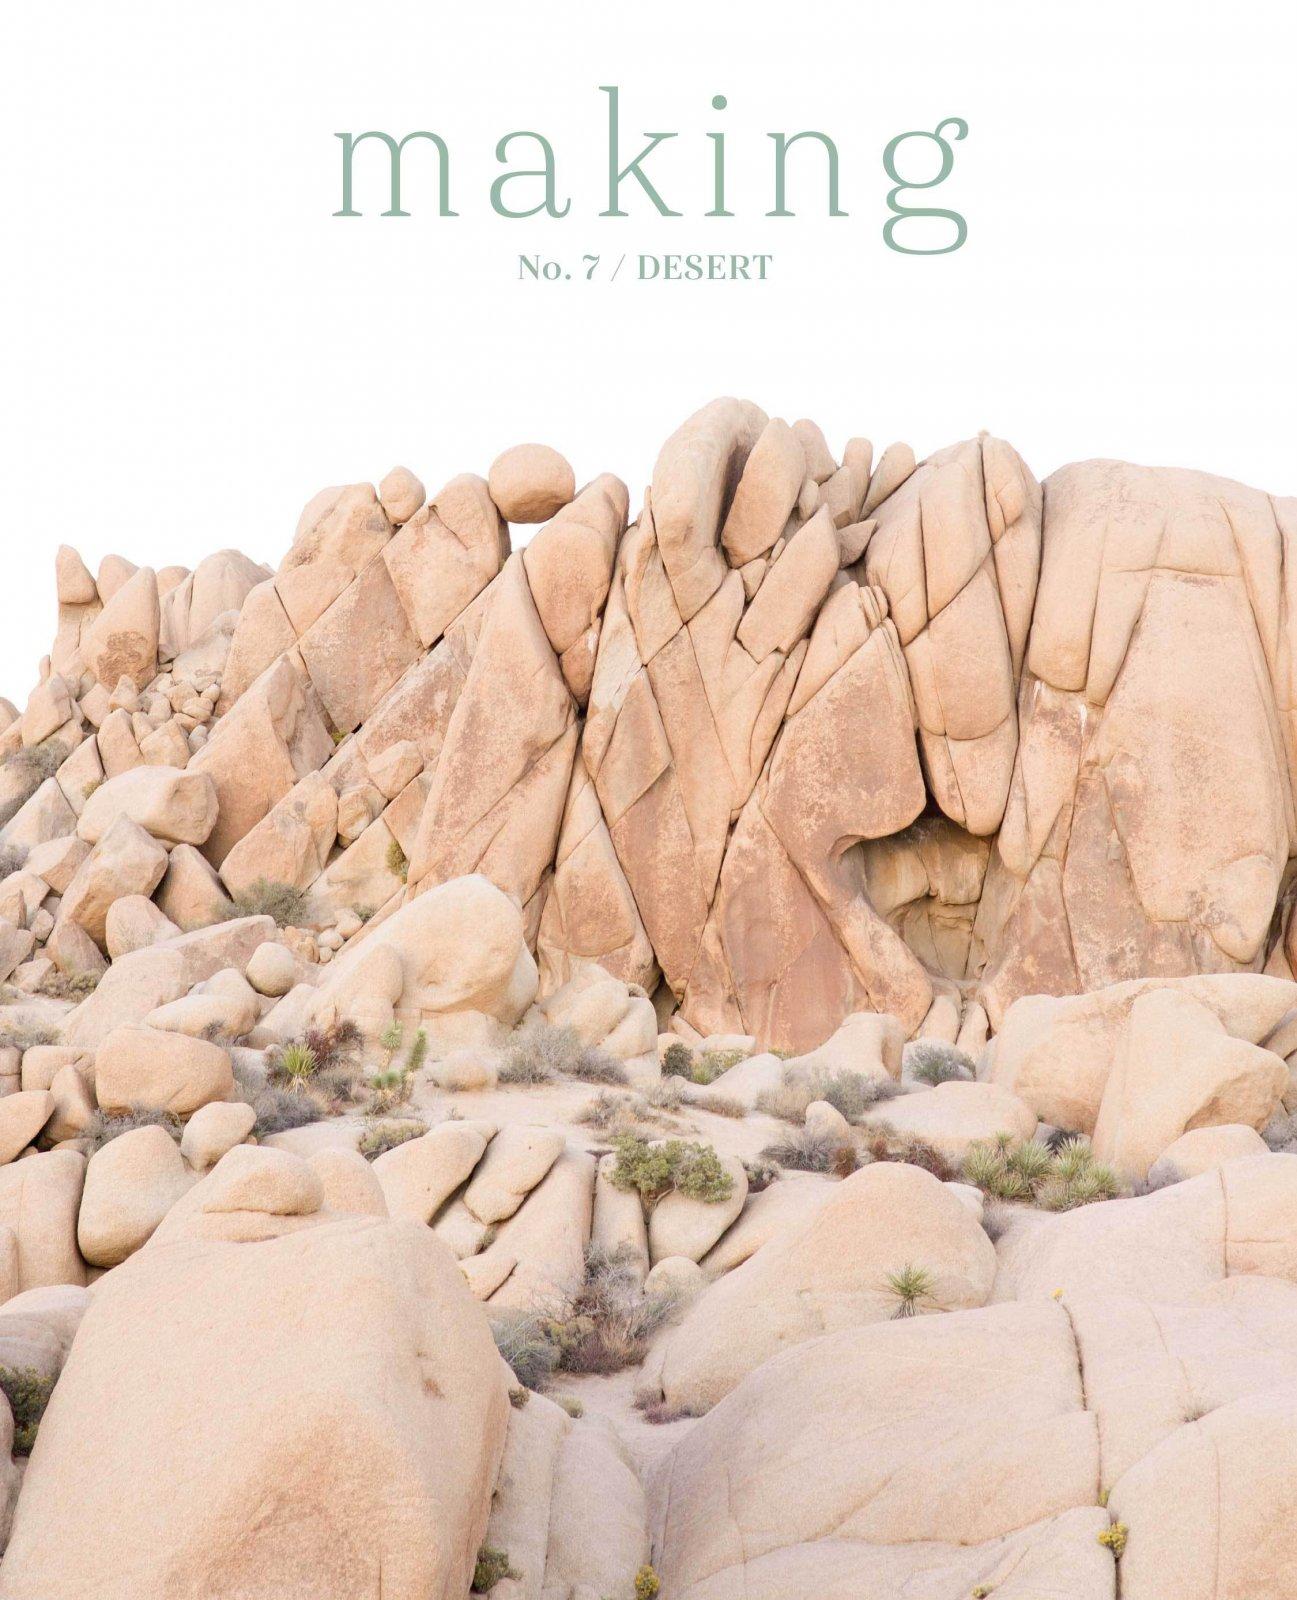 Making No.7 - Desert